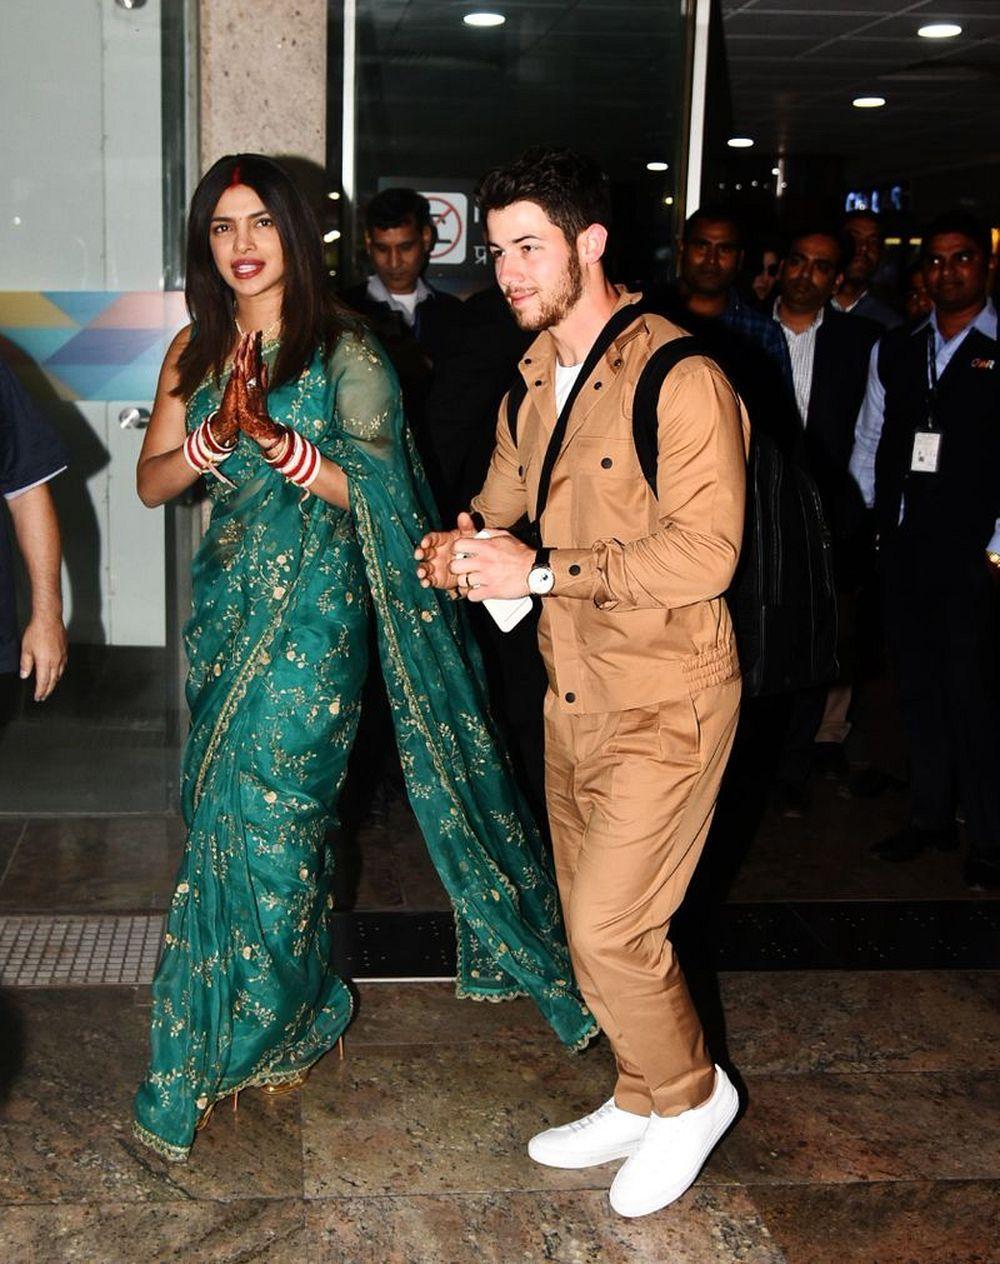 Is It Real Or A Sham Nick Jonas And Priyanka Chopra Marriage Priyanka Chopra Priyanka Chopra Wedding Bollywood Celebrities